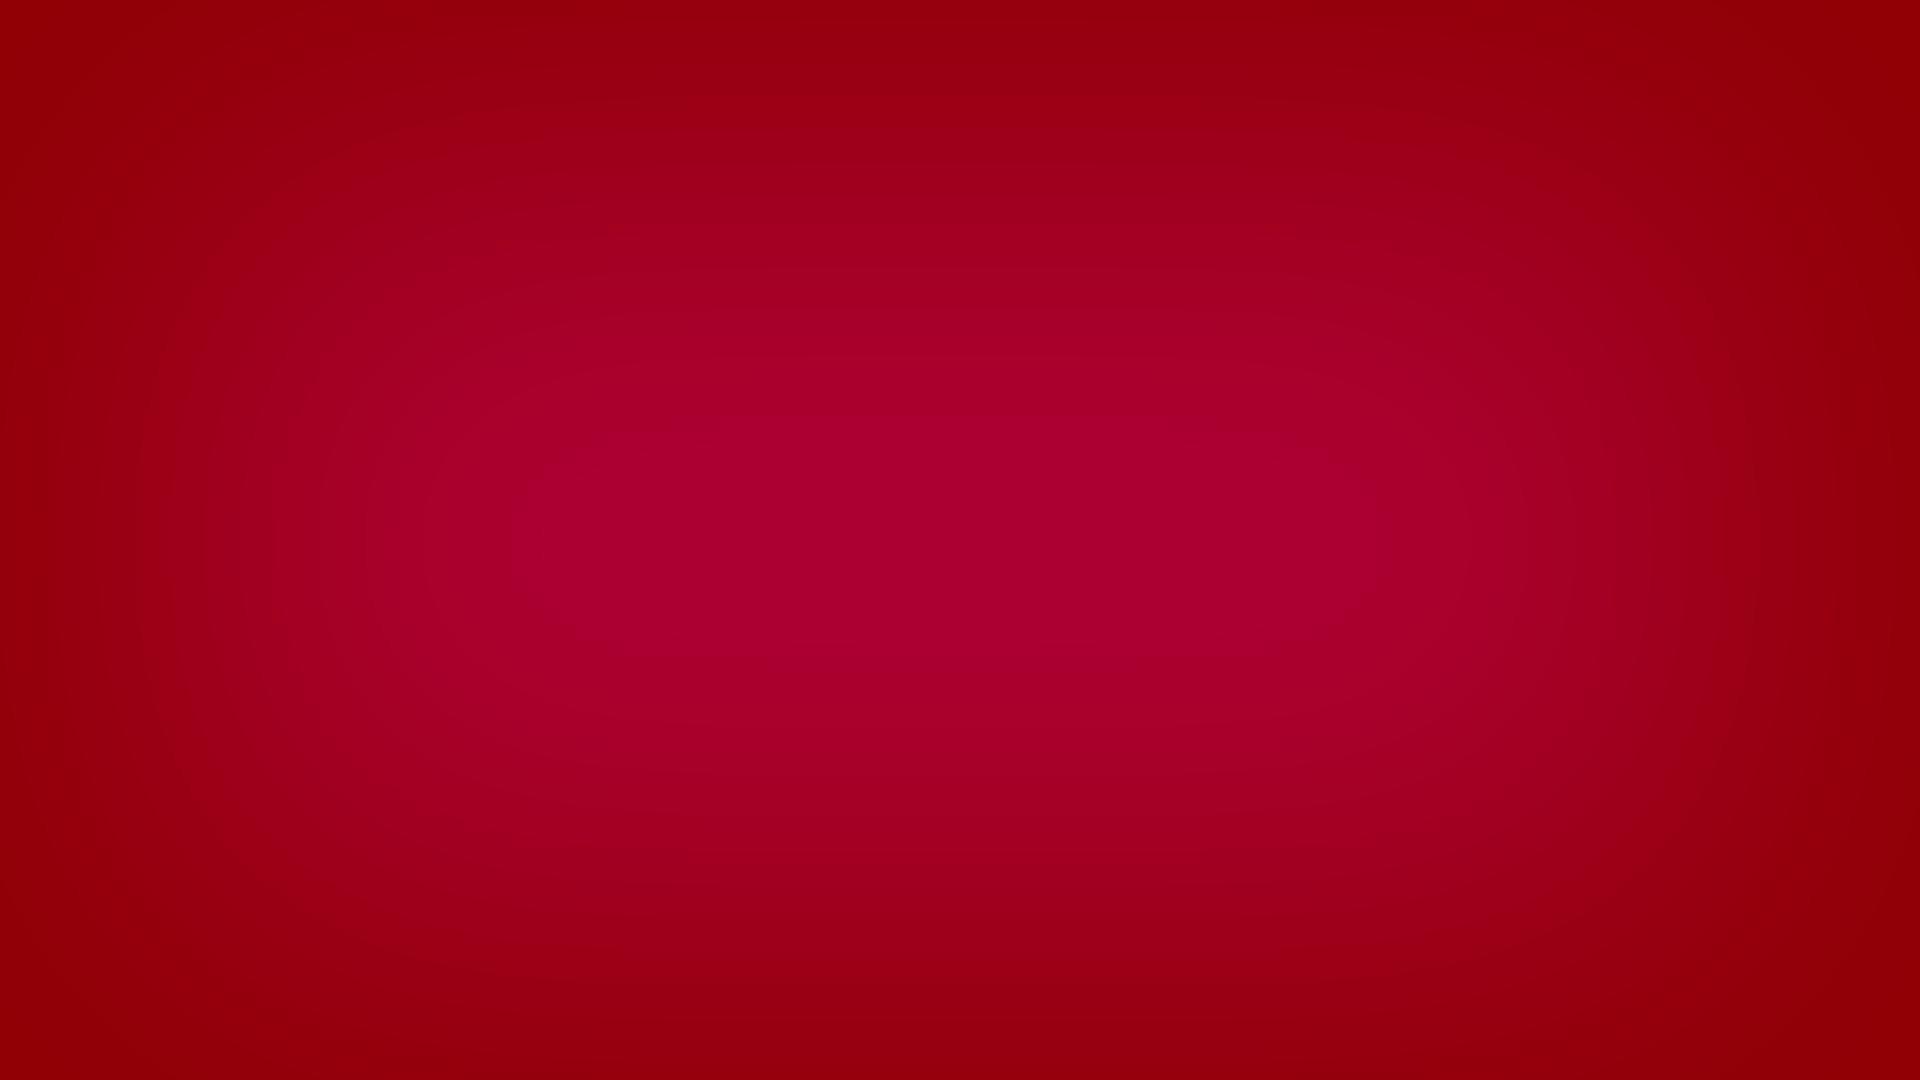 wallpaper.wiki-Dark-Pink-Backgrounds-Desktop-PIC-WPB008815